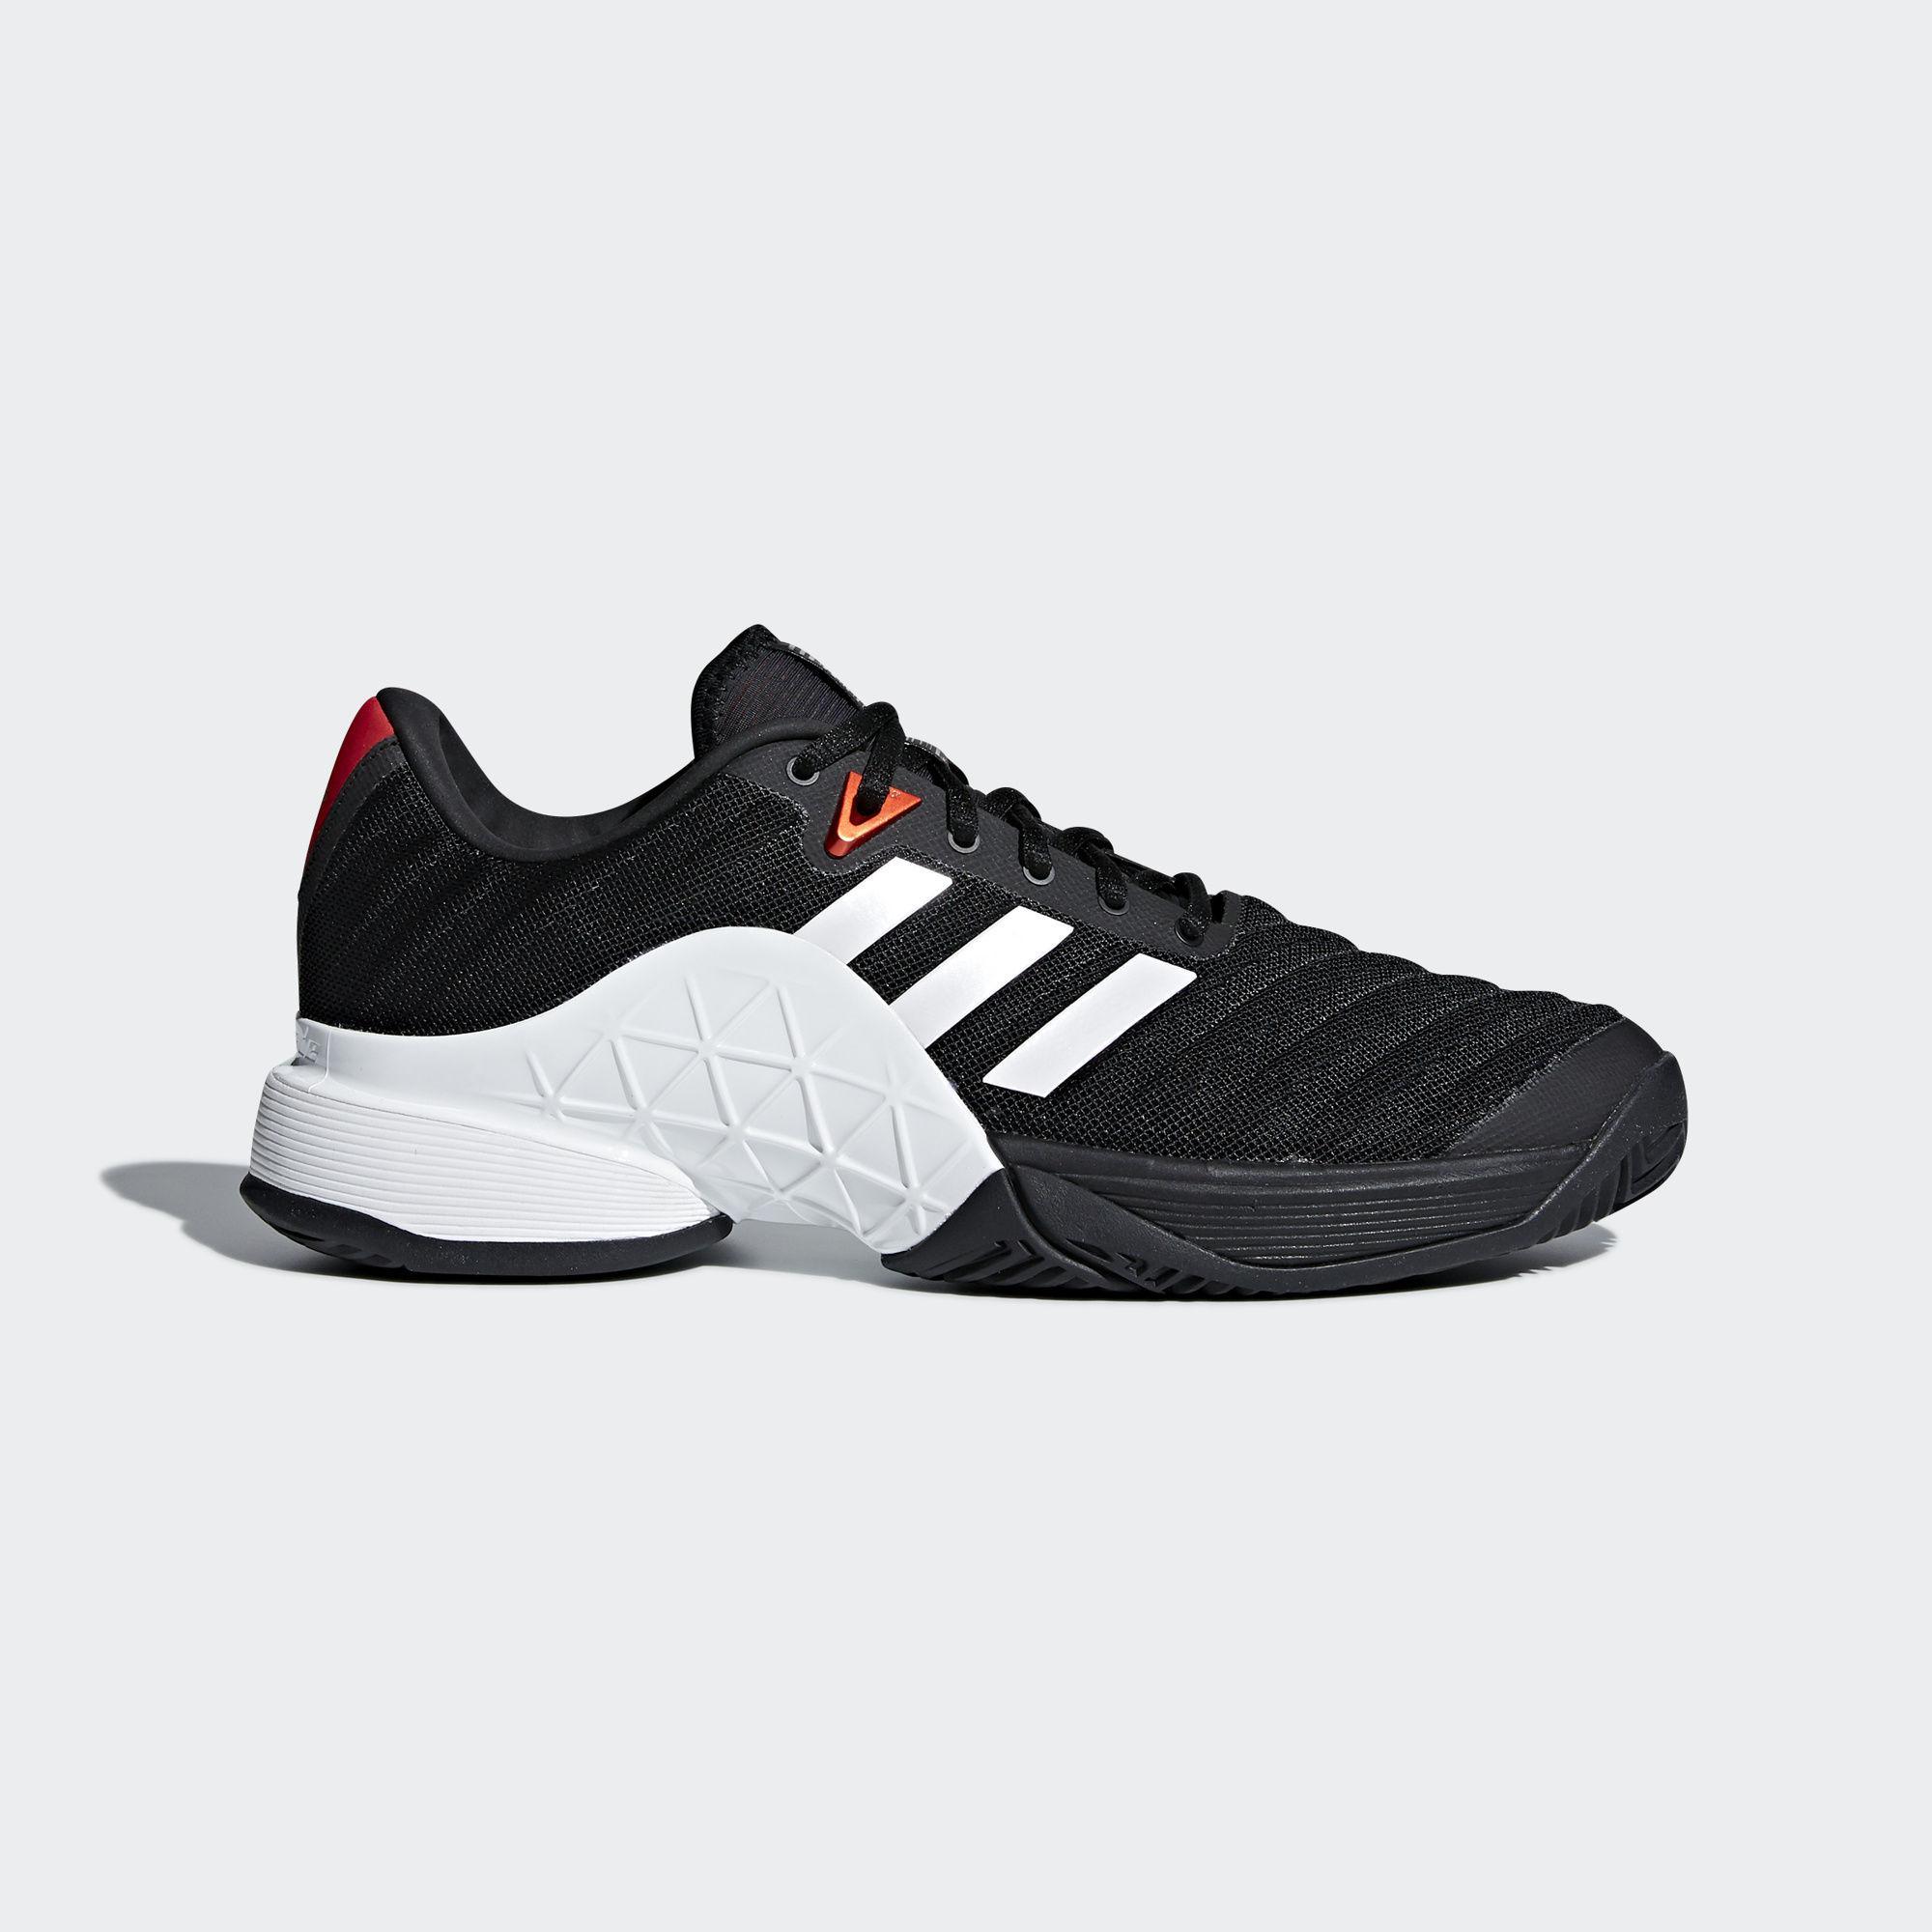 Adidas Mens Barricade 2018 Tennis Shoes - Black/White ...